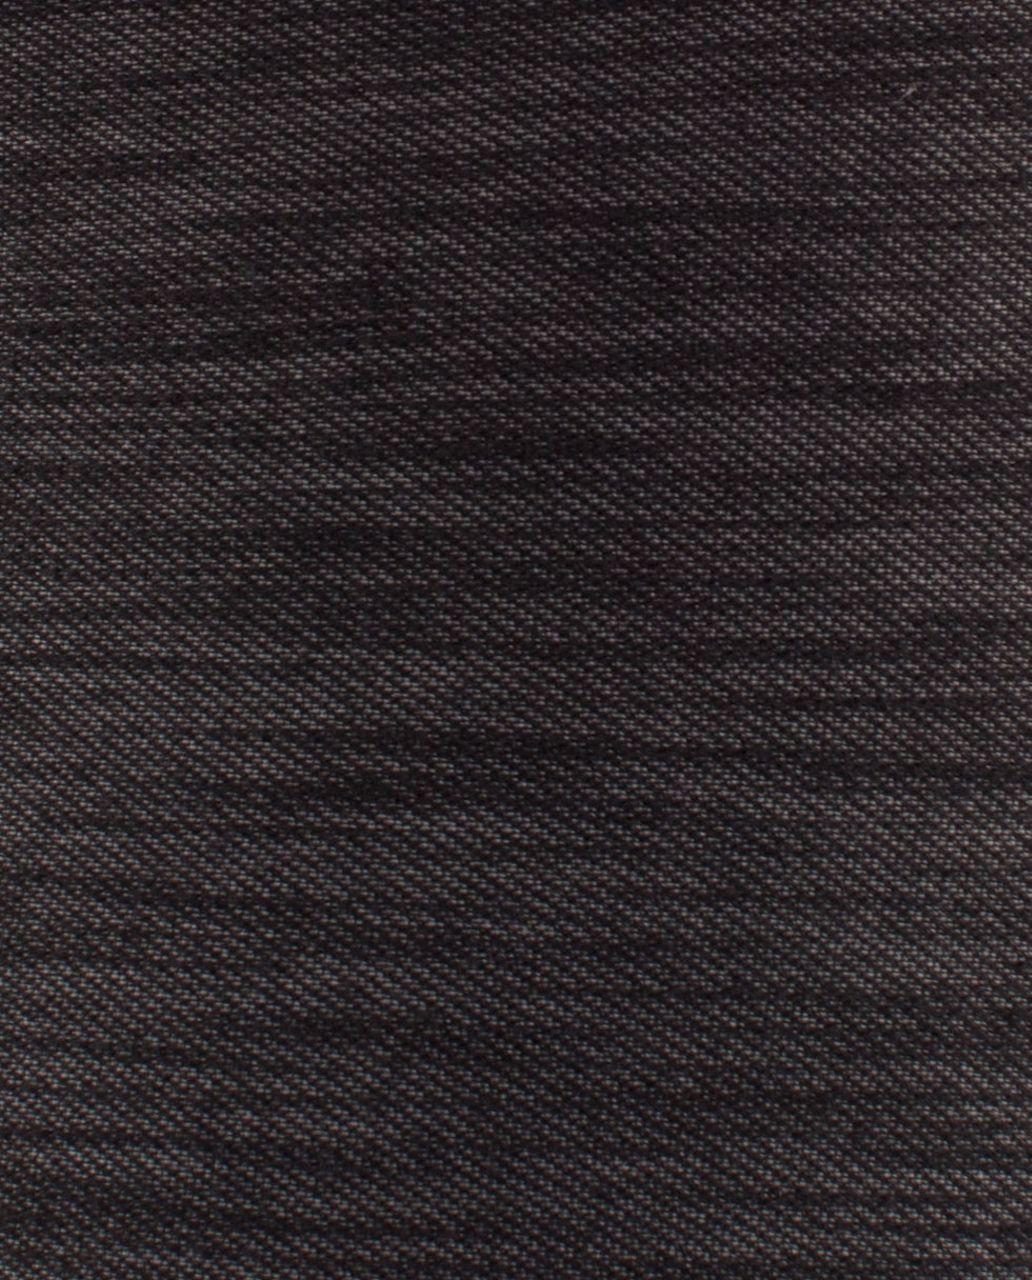 Lululemon Wunder Under Pant *Denim - Black Slub Denim